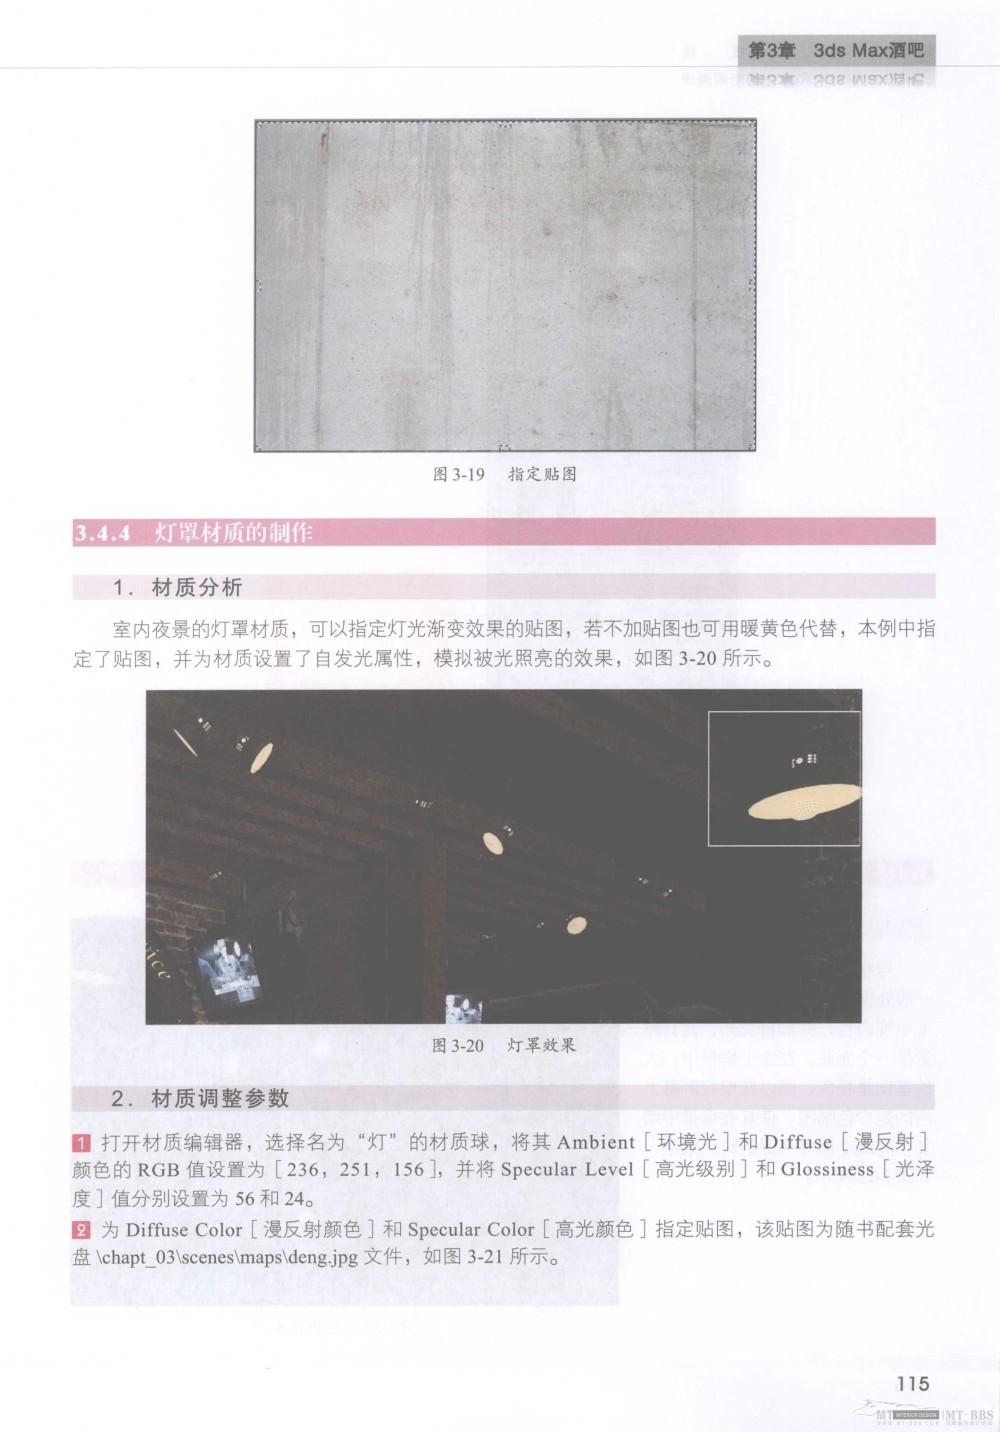 水晶石技法-3ds_Max&VRay室内空间表现_水晶石技法-3ds_Max&VRay室内空间表现_页面_121.jpg